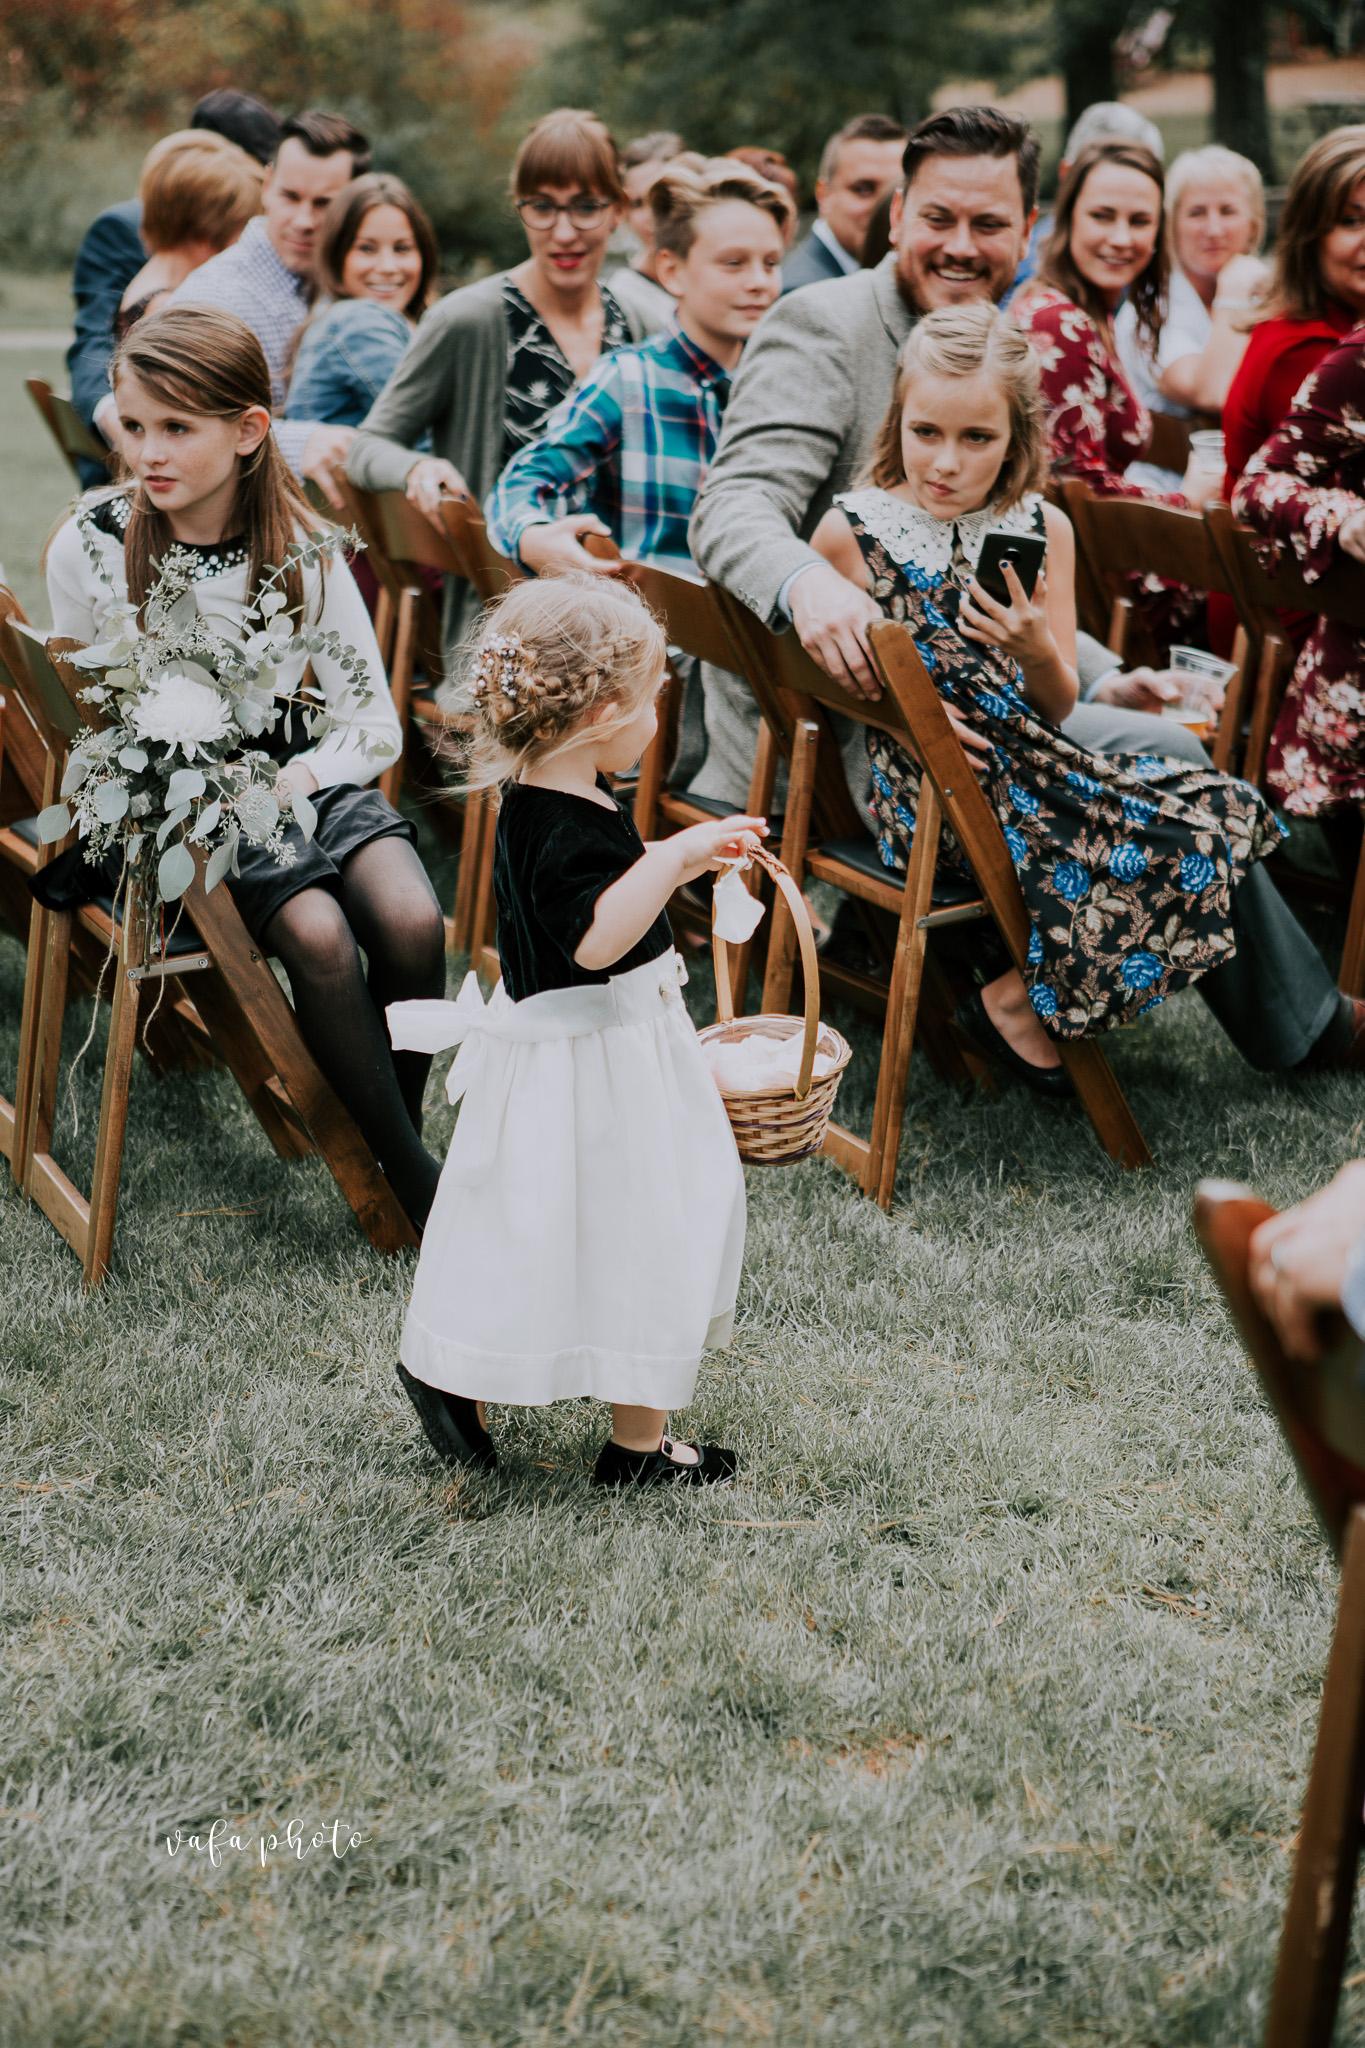 Grand-Rapids-Wedding-Danielle-Brian-Vafa-Photo-649.jpg